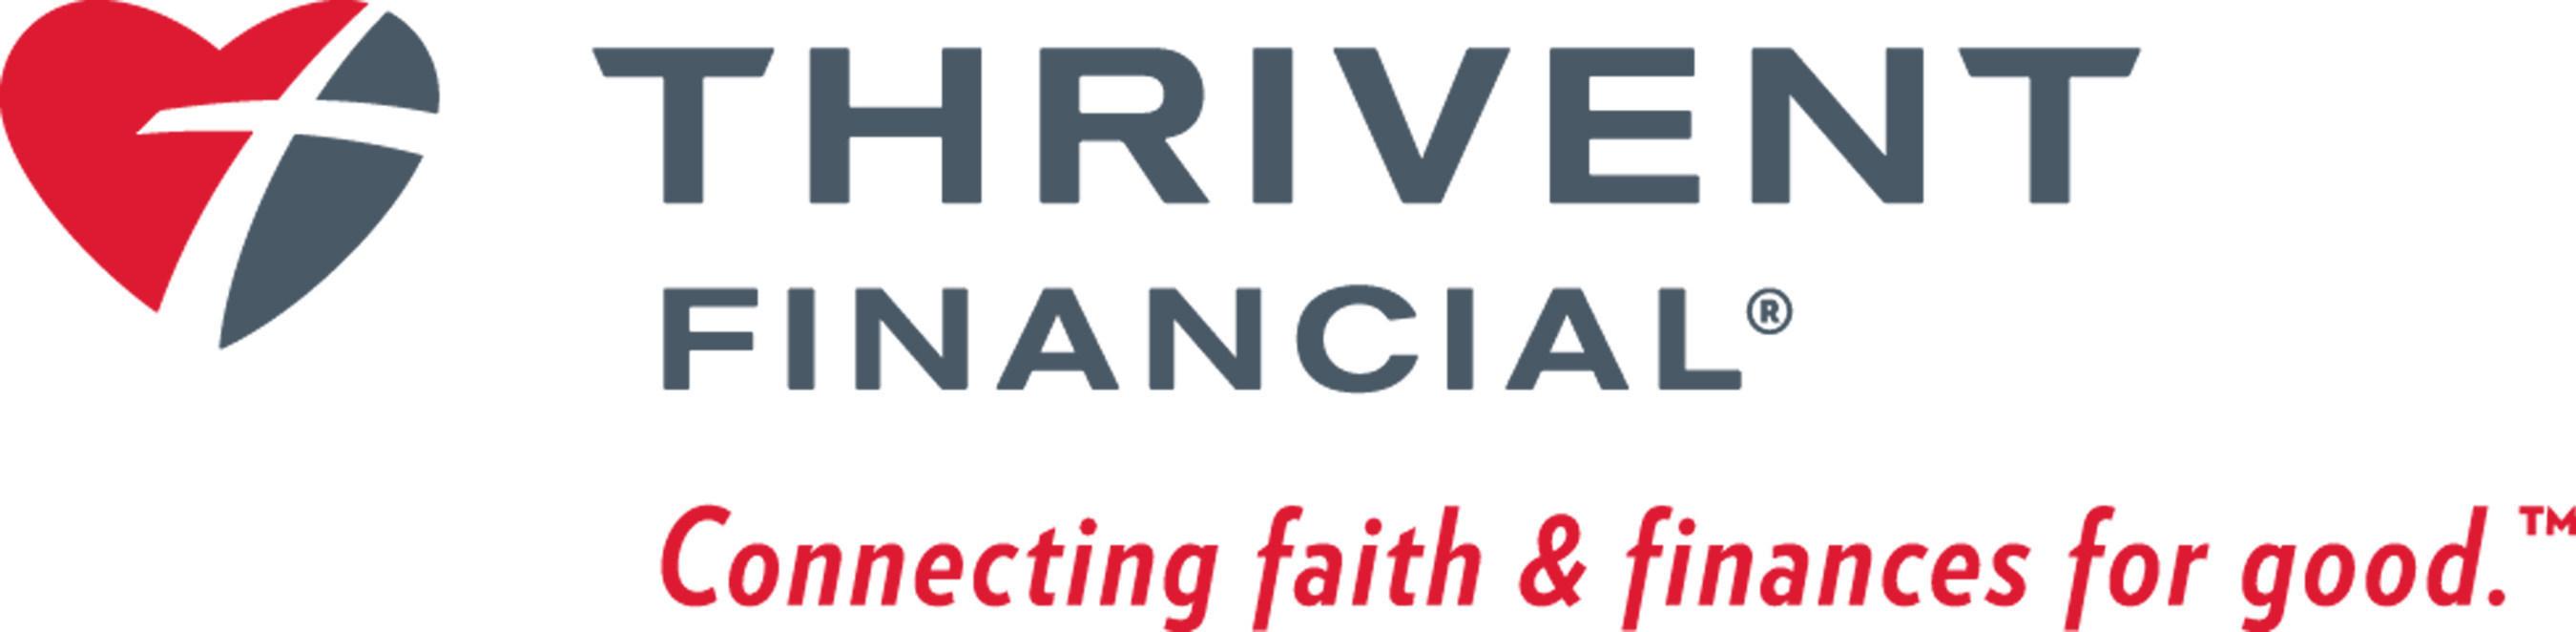 Thrivent Financial logo